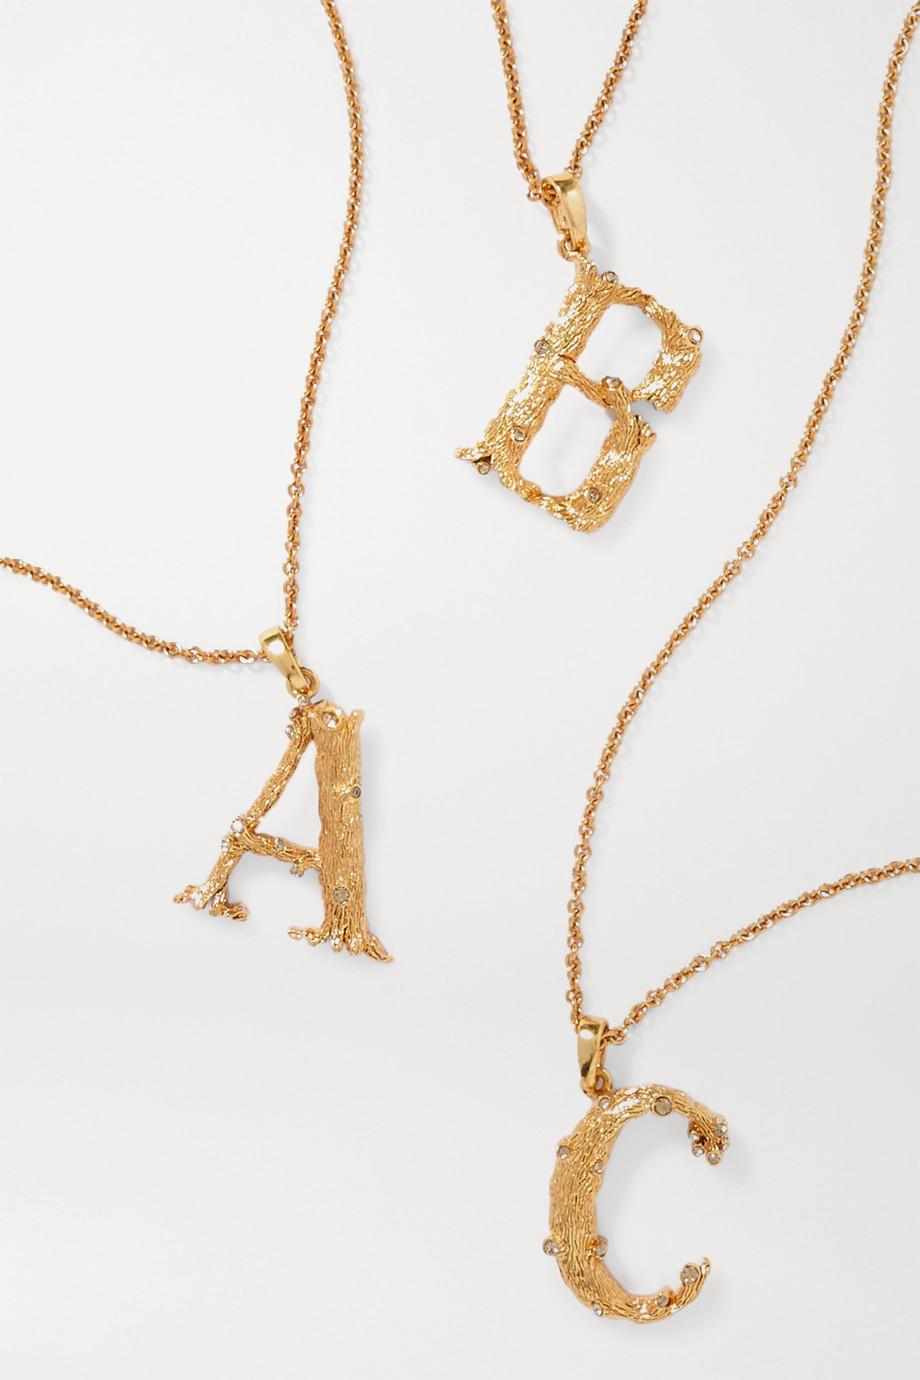 Oscar de la Renta Letter vergoldete Kette mit Kristallen